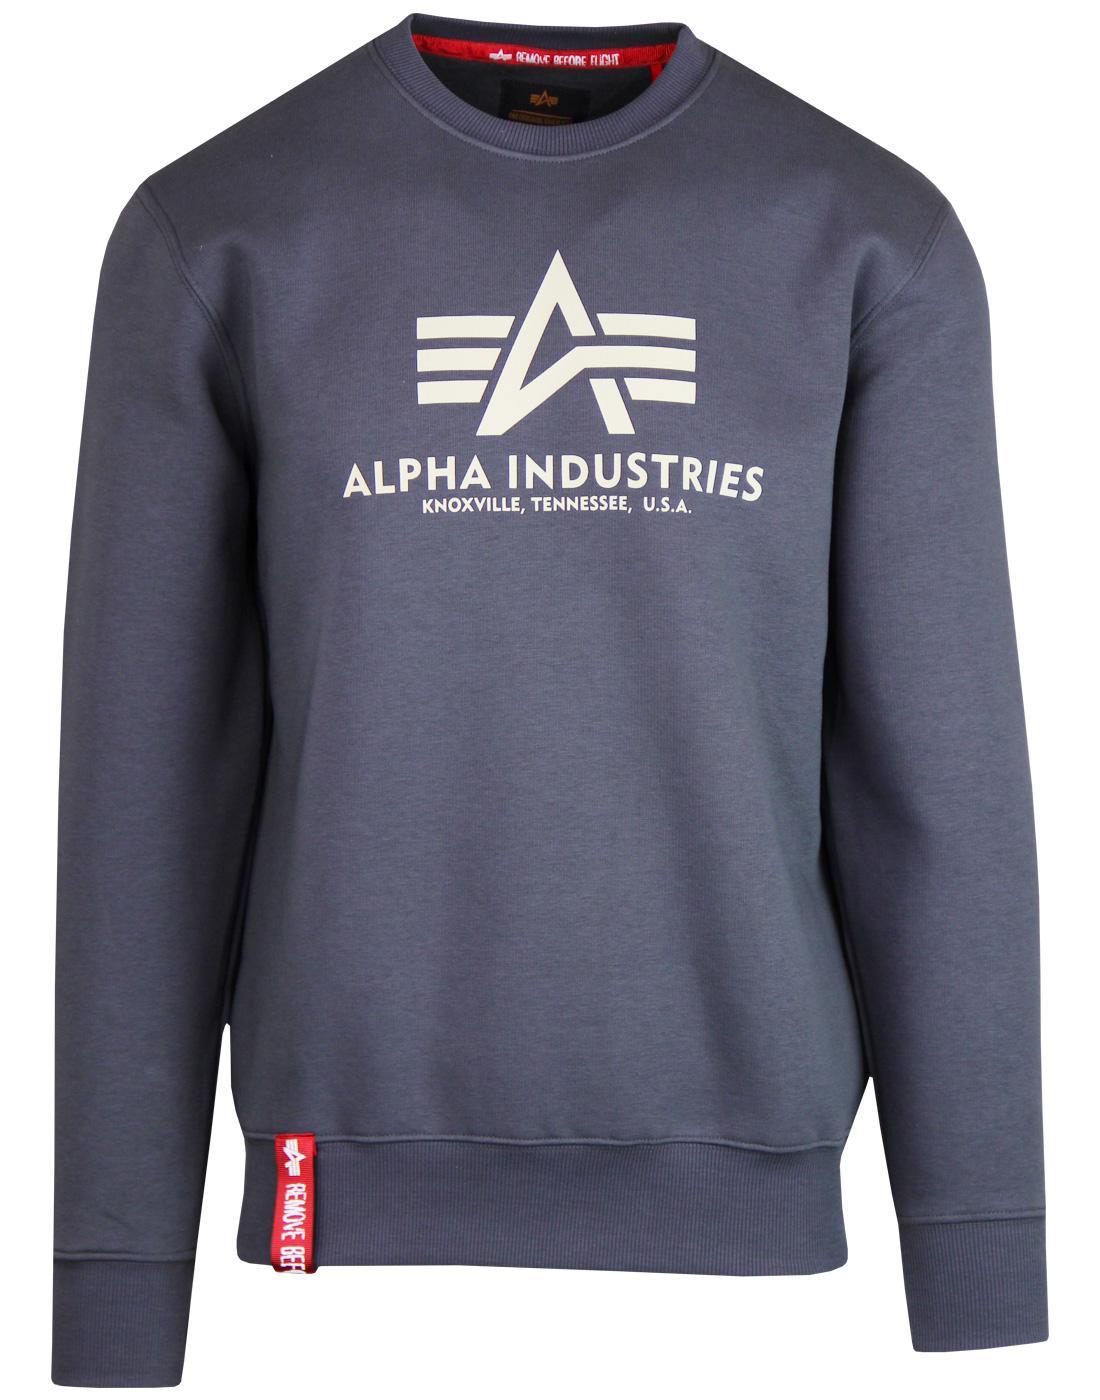 ALPHA INDUSTRIES Retro 70s Basic Logo Sweatshirt G